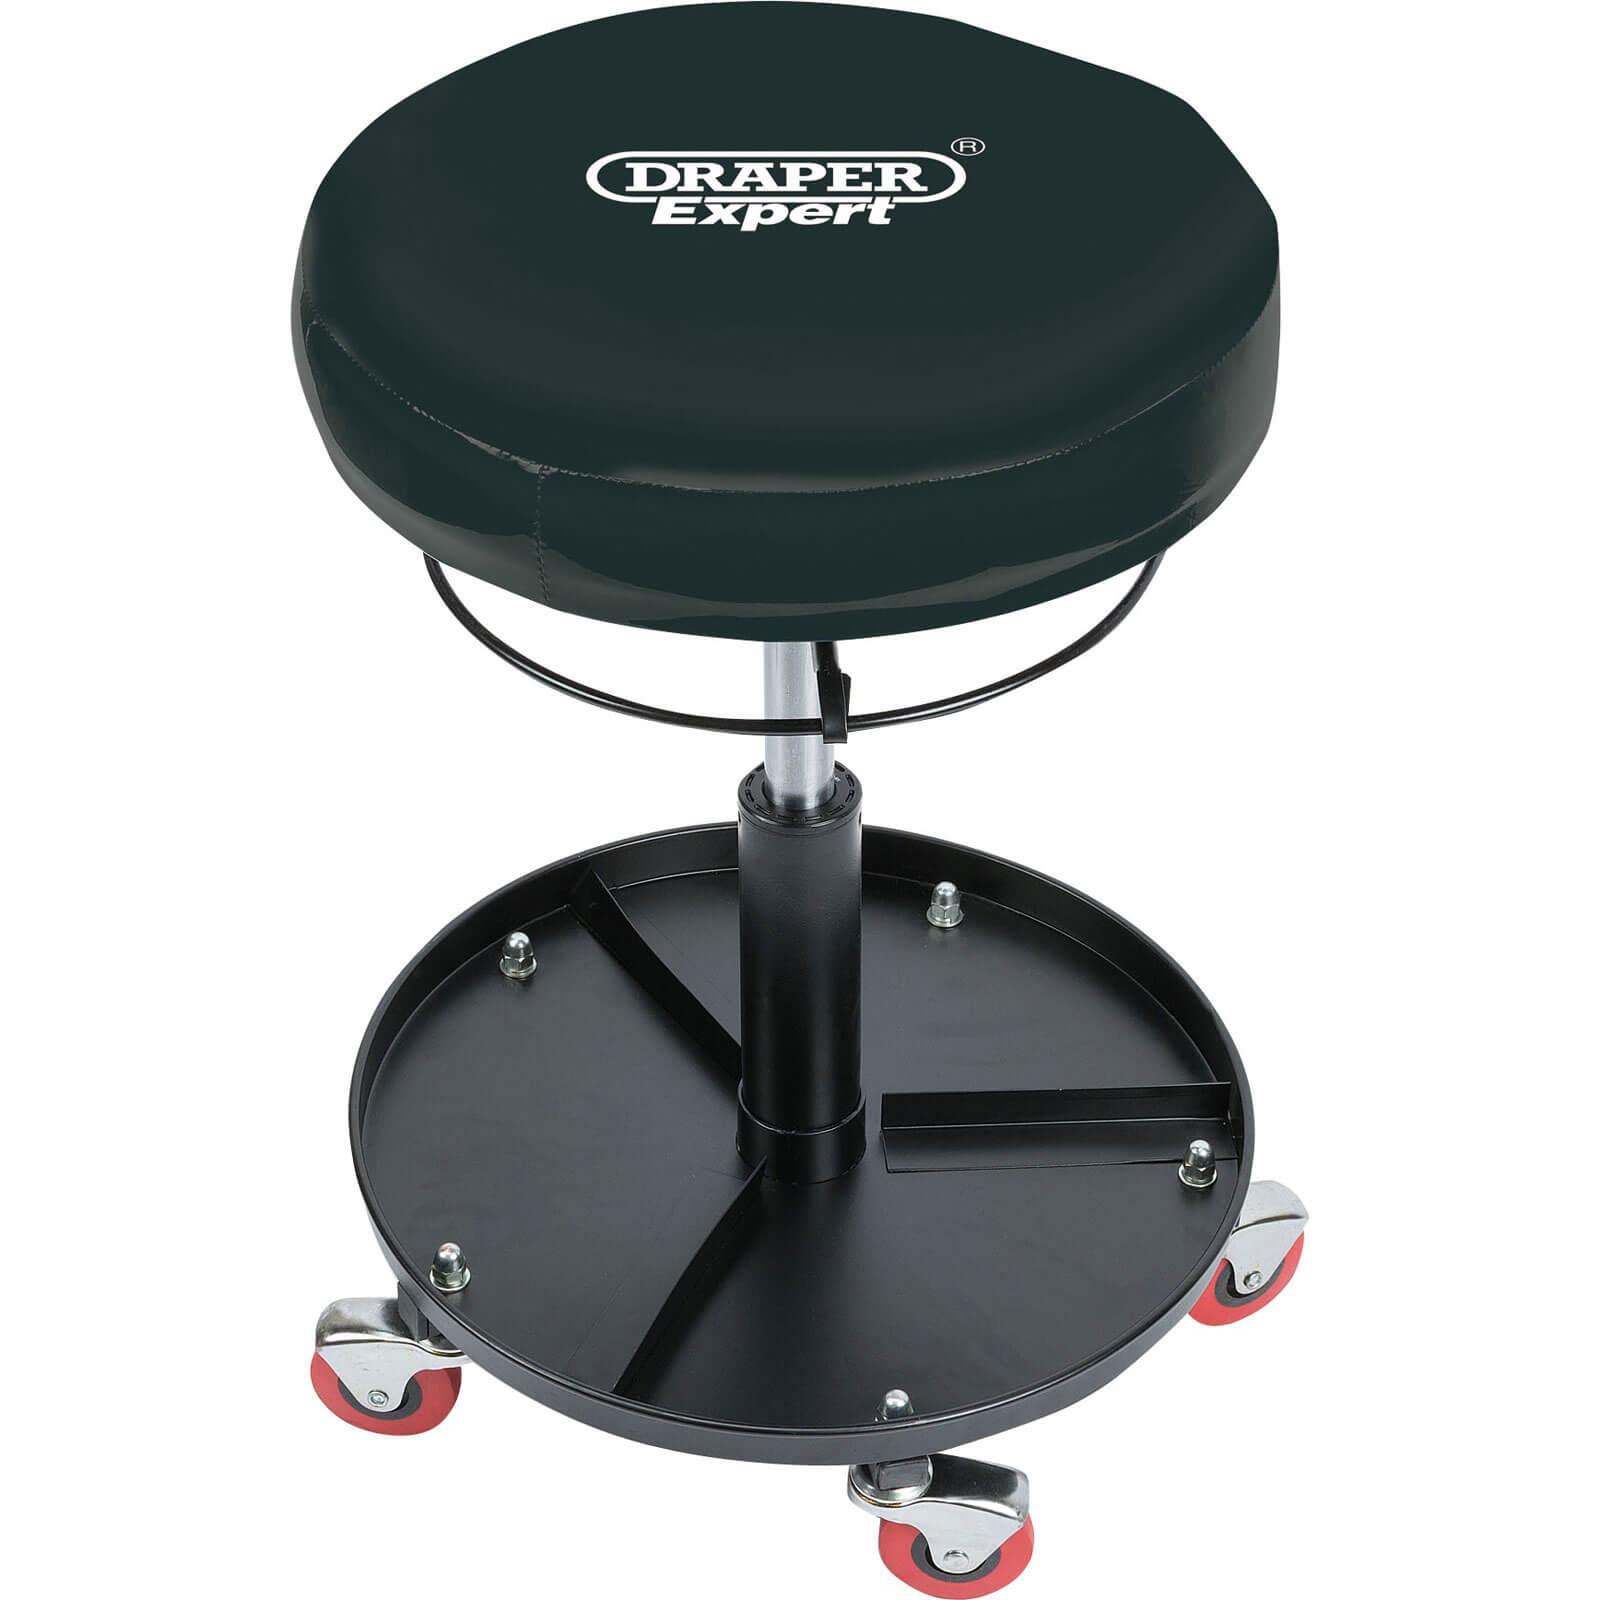 Image of Draper Expert Adjustable Work Seat